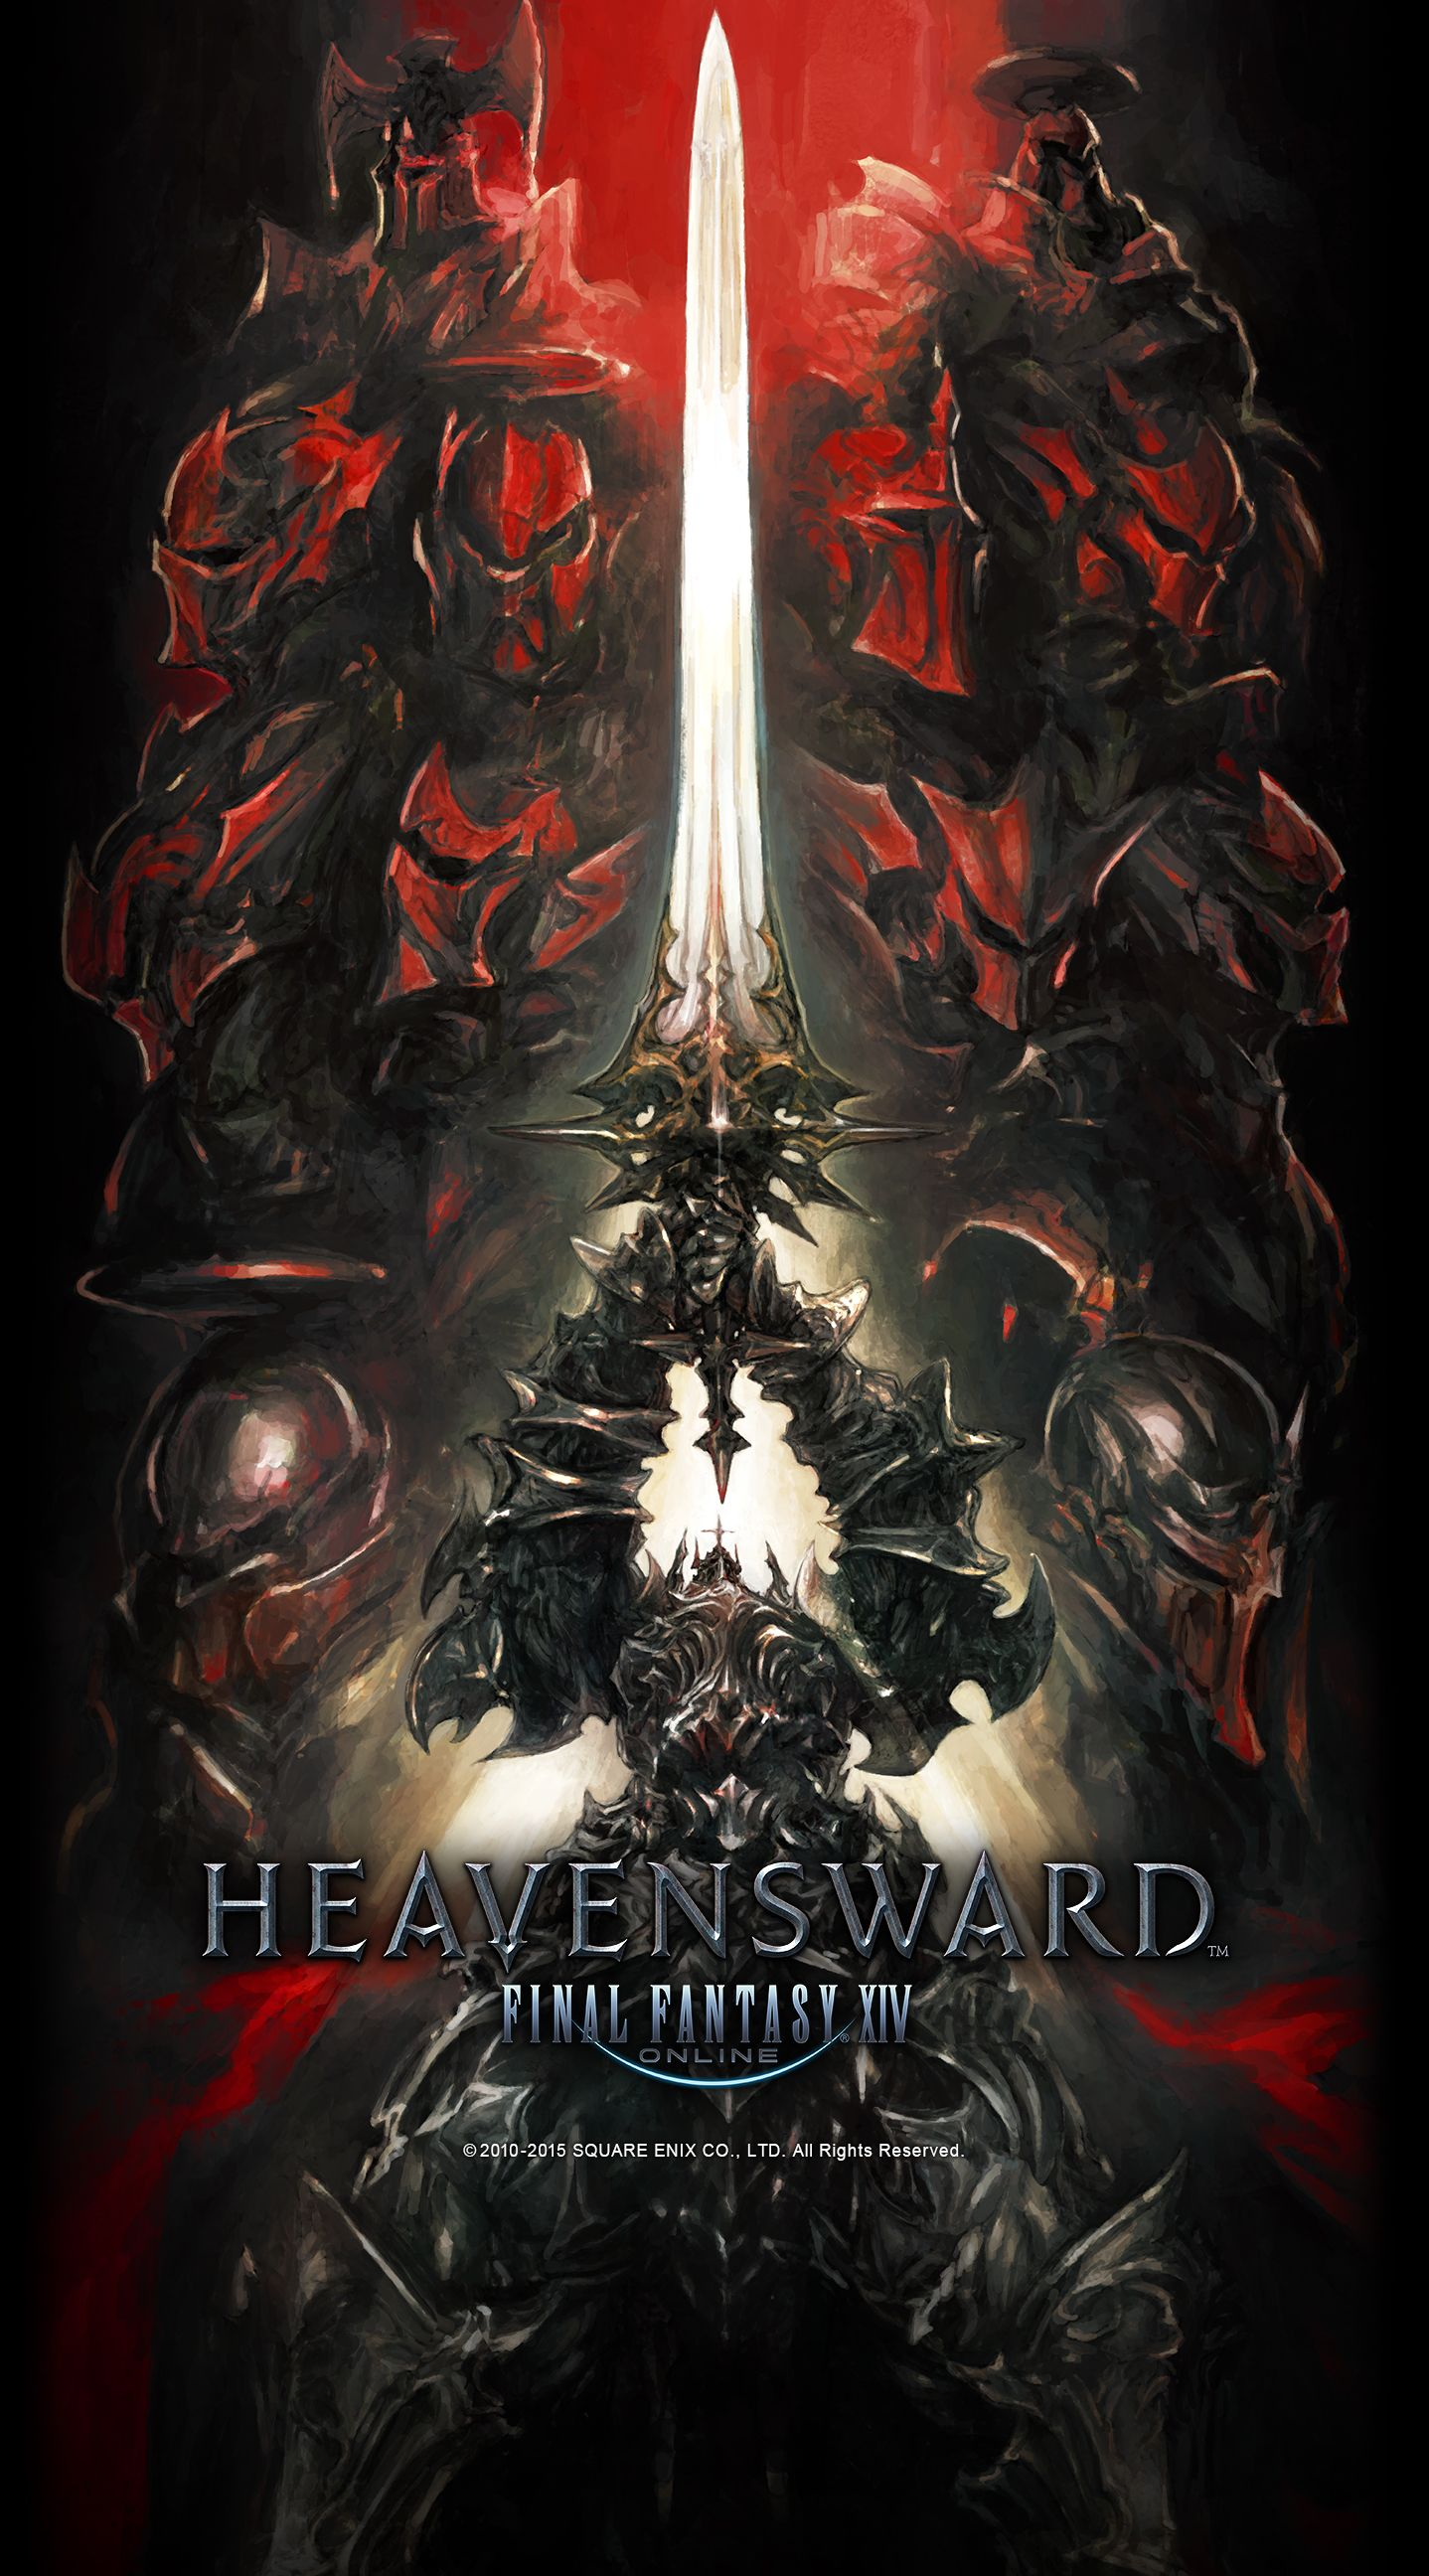 Ffxiv Spw23004 1438x2592 Jpg 1438 2592 Final Fantasy Art